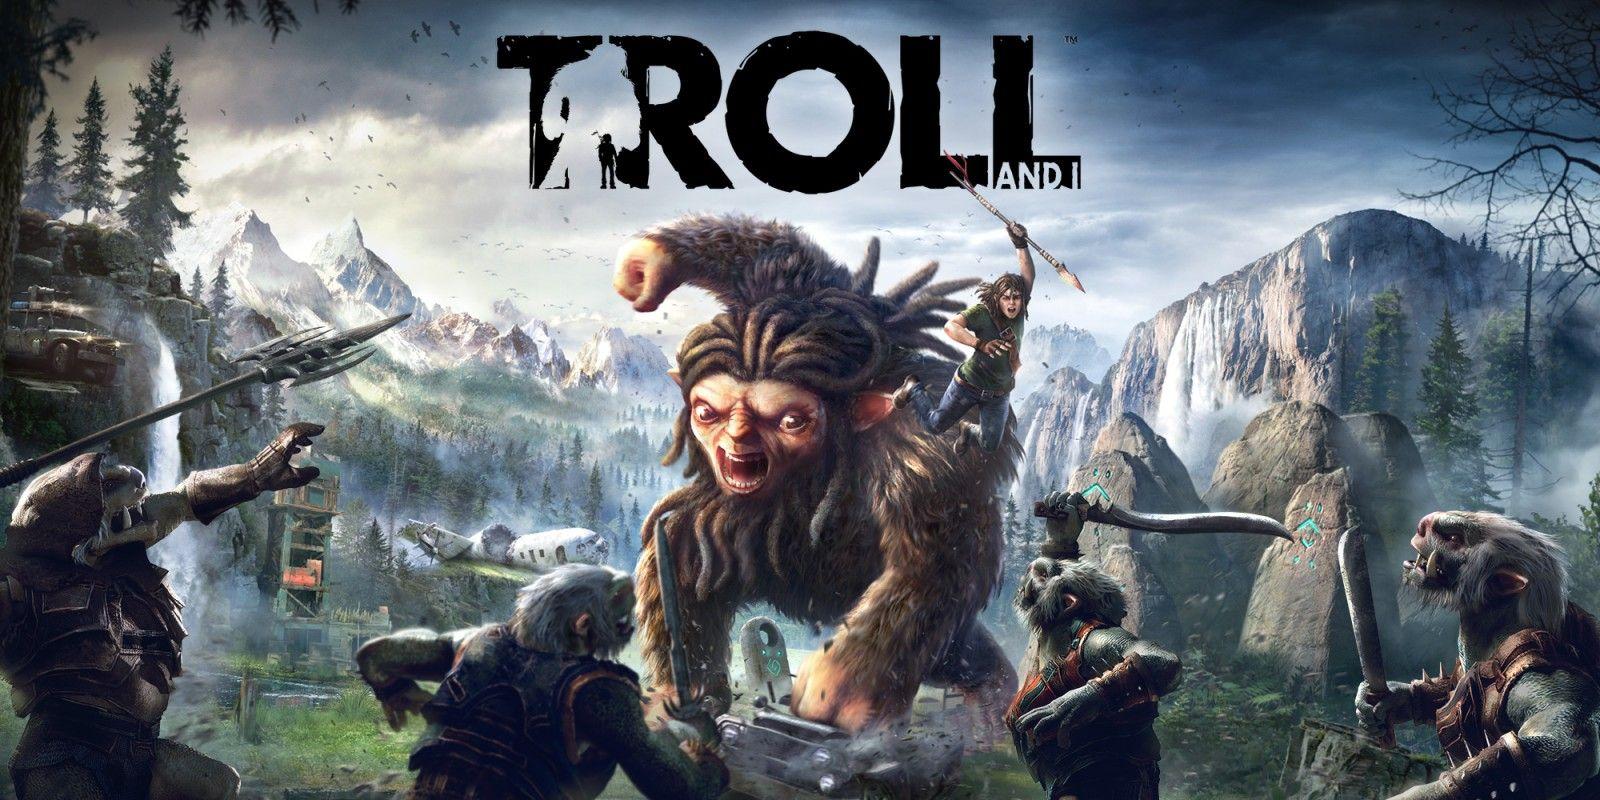 Troll and I Nintendo Switch eShop